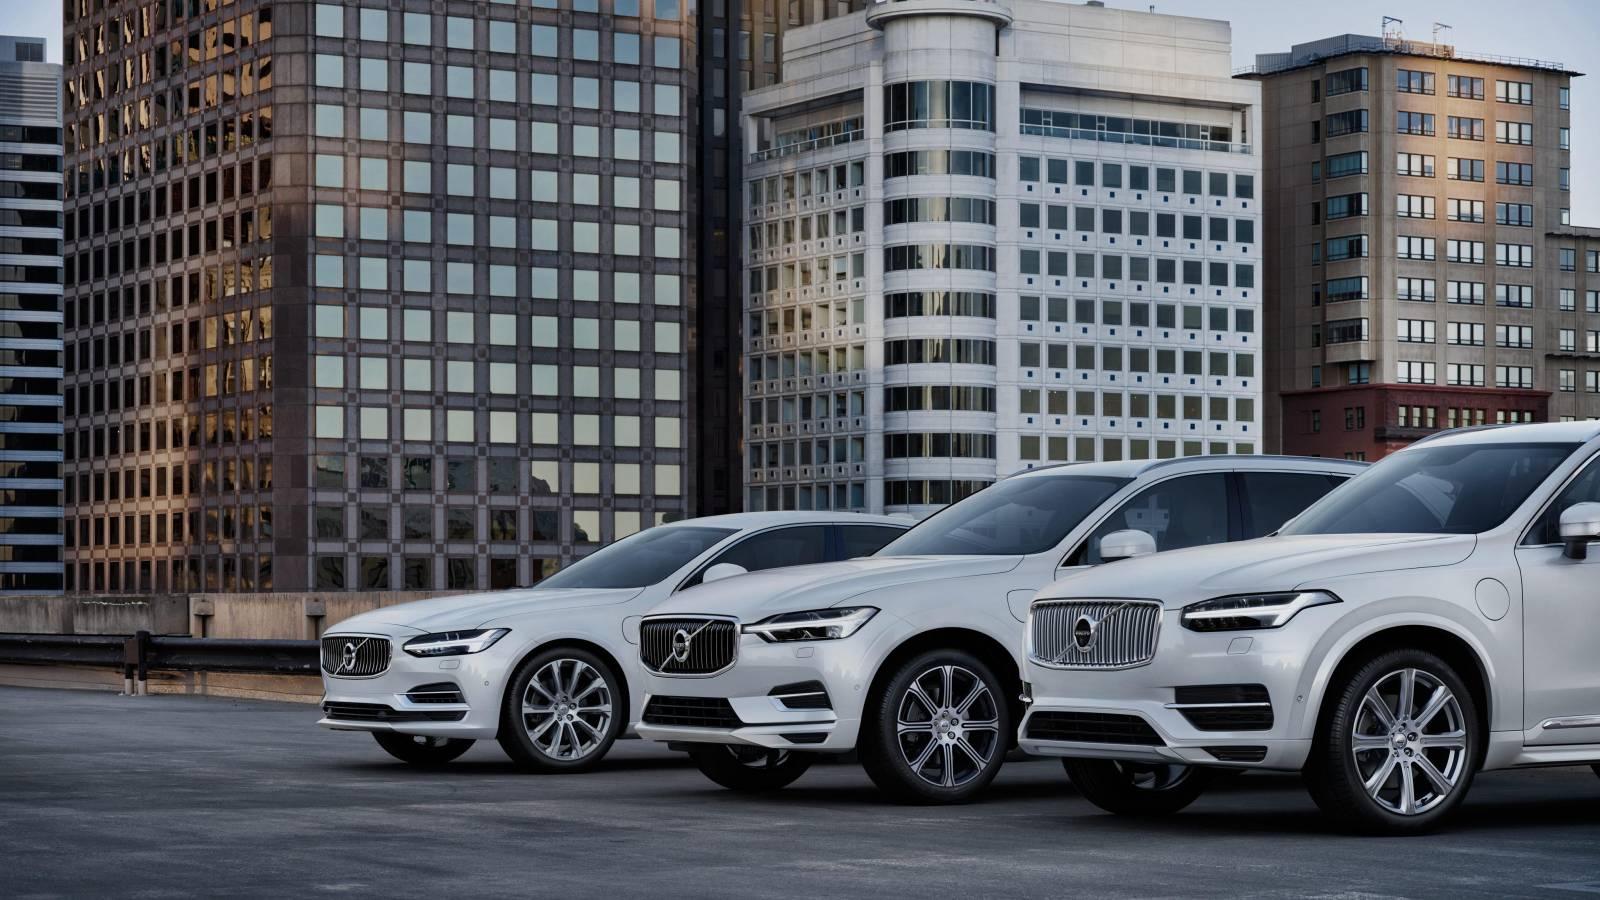 Nabídky a inovace vozů Volvo